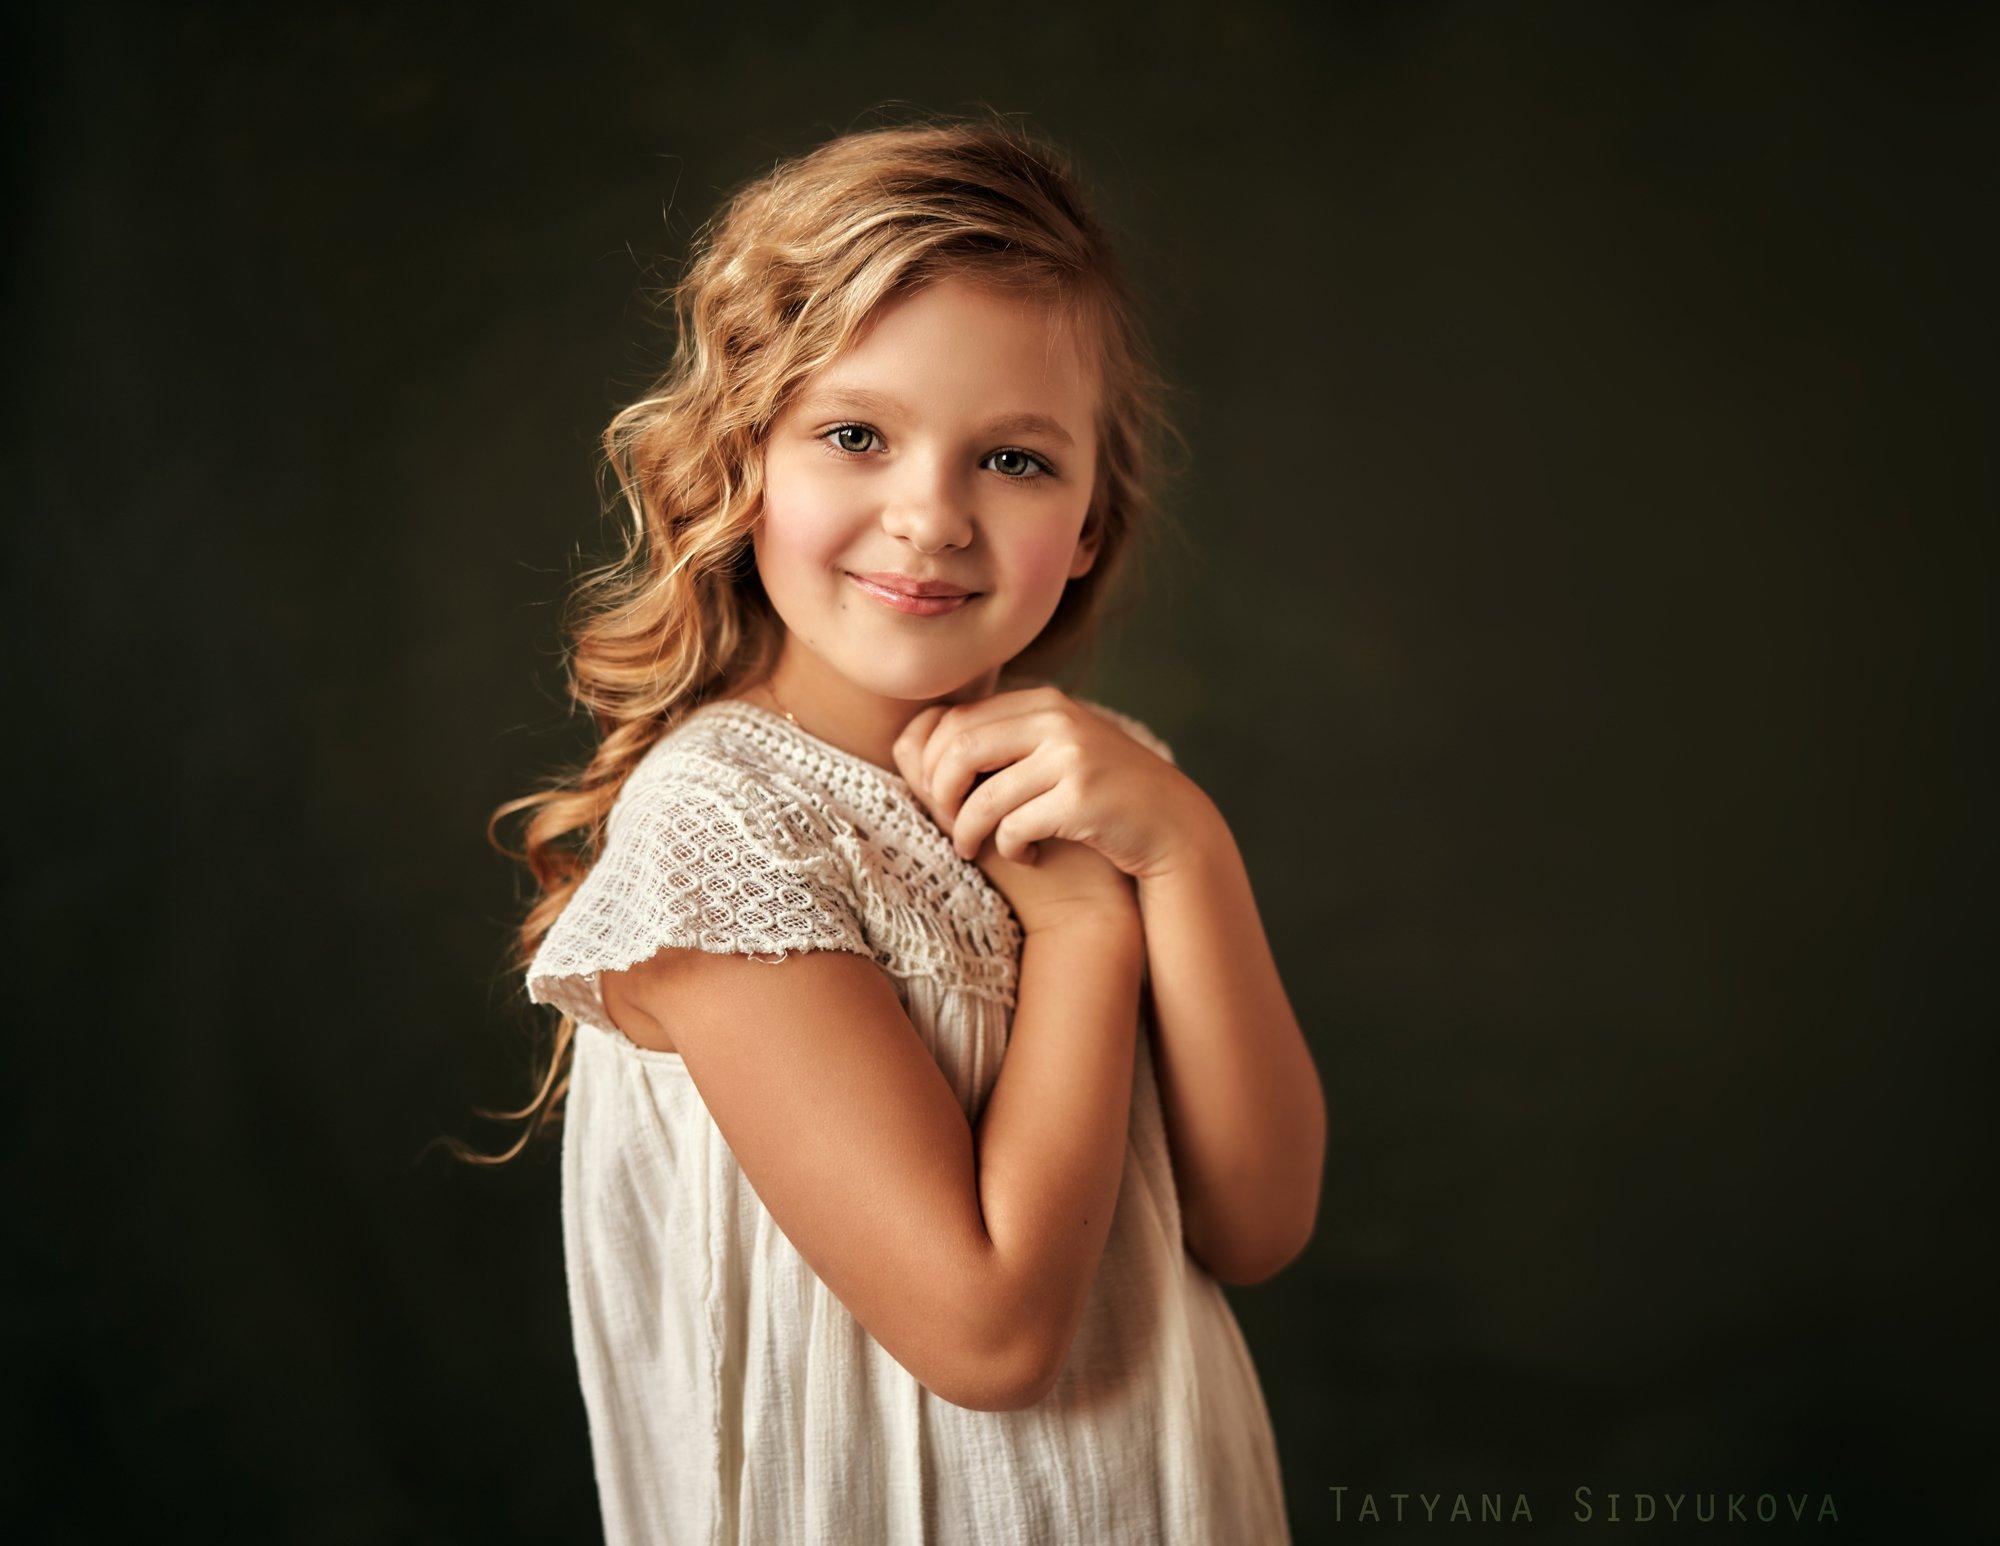 девочка, красивая, блондинка, красивый портрет, портрет, tanyasid, Татьяна Сидюкова